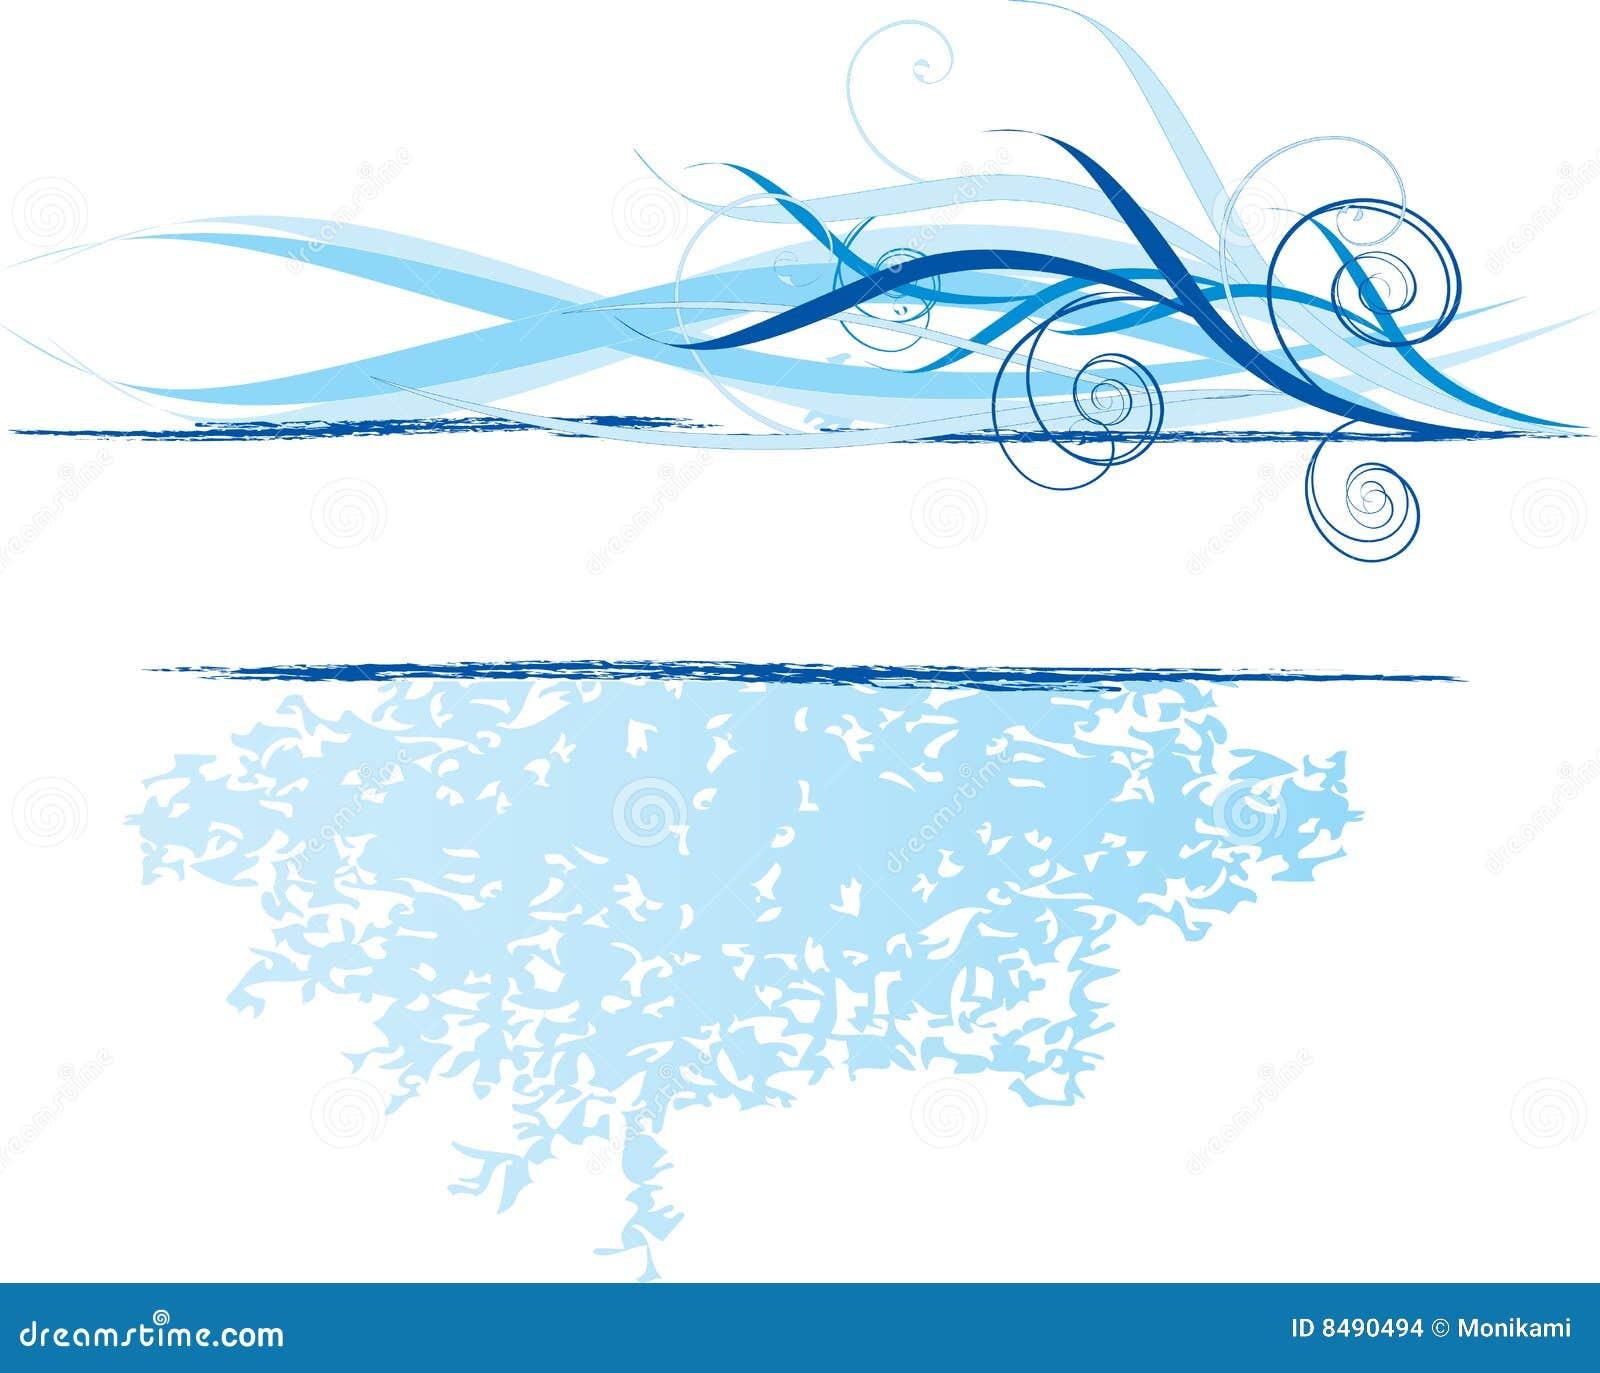 blue banner design element stock vector illustration of sample